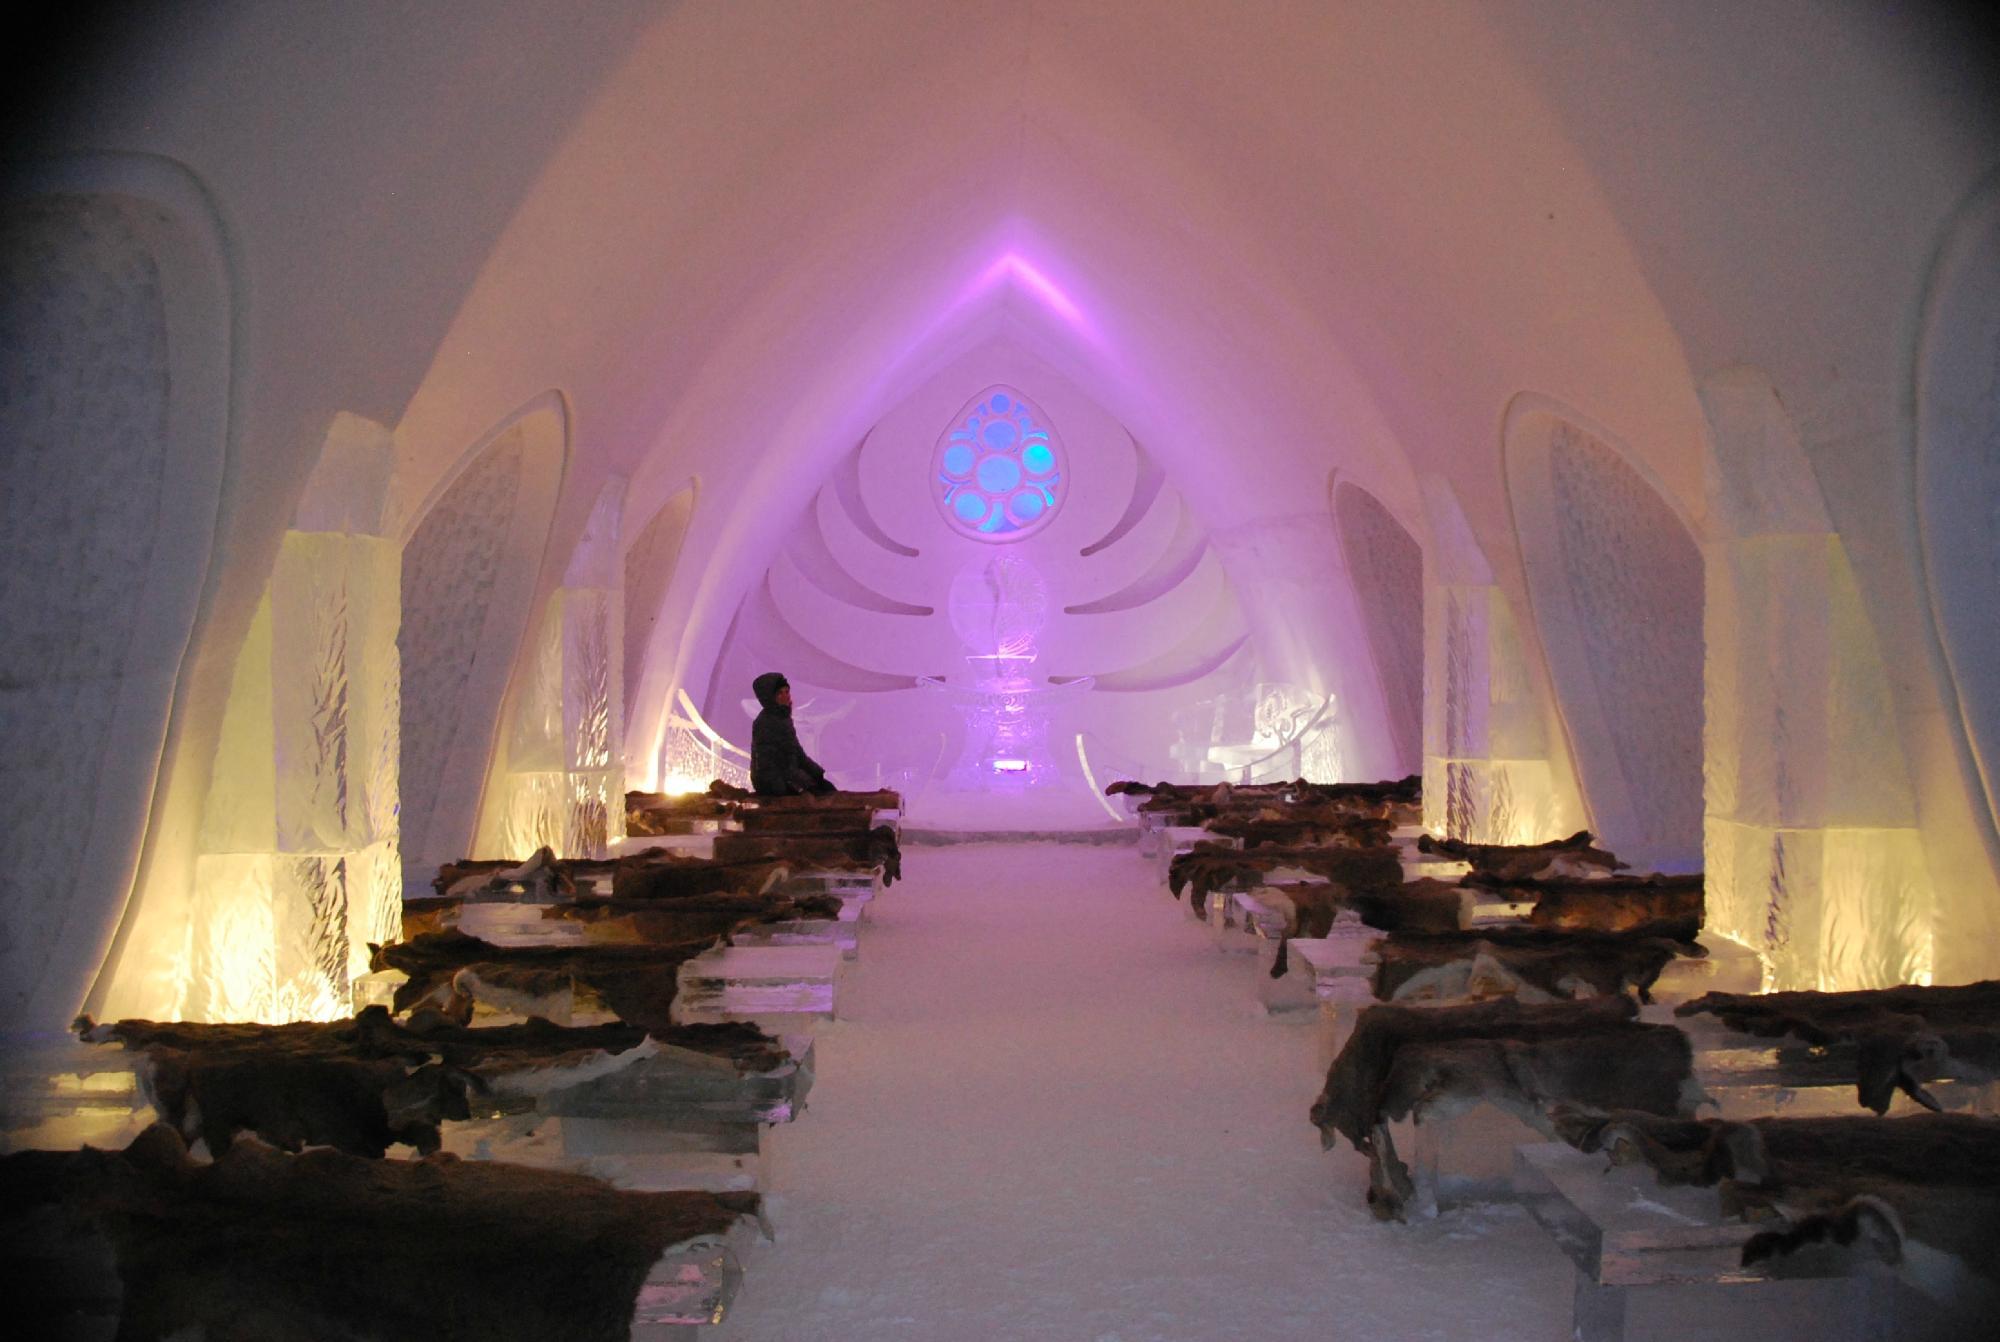 Hotel De Glace Quebec City Top Tips Before You Go